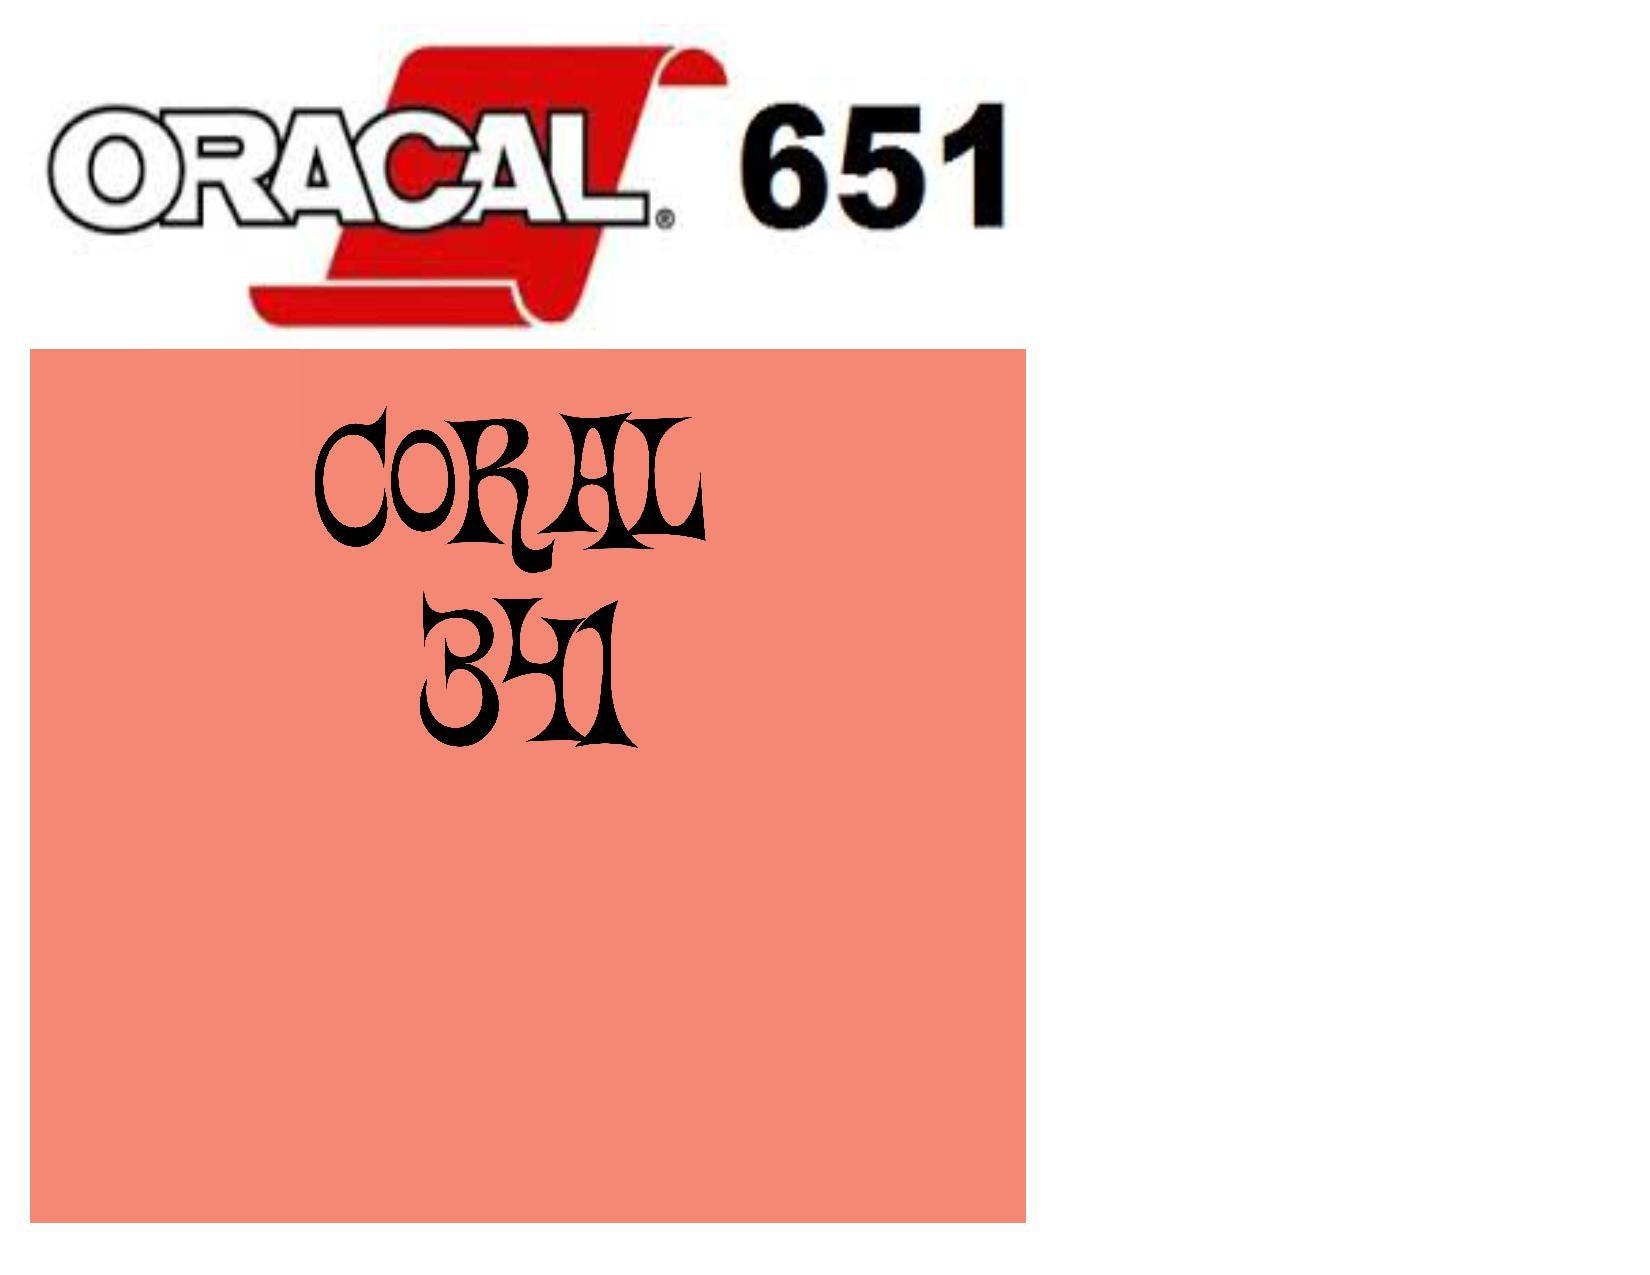 Oracal 651 Adhesive Vinyl 341 Coral